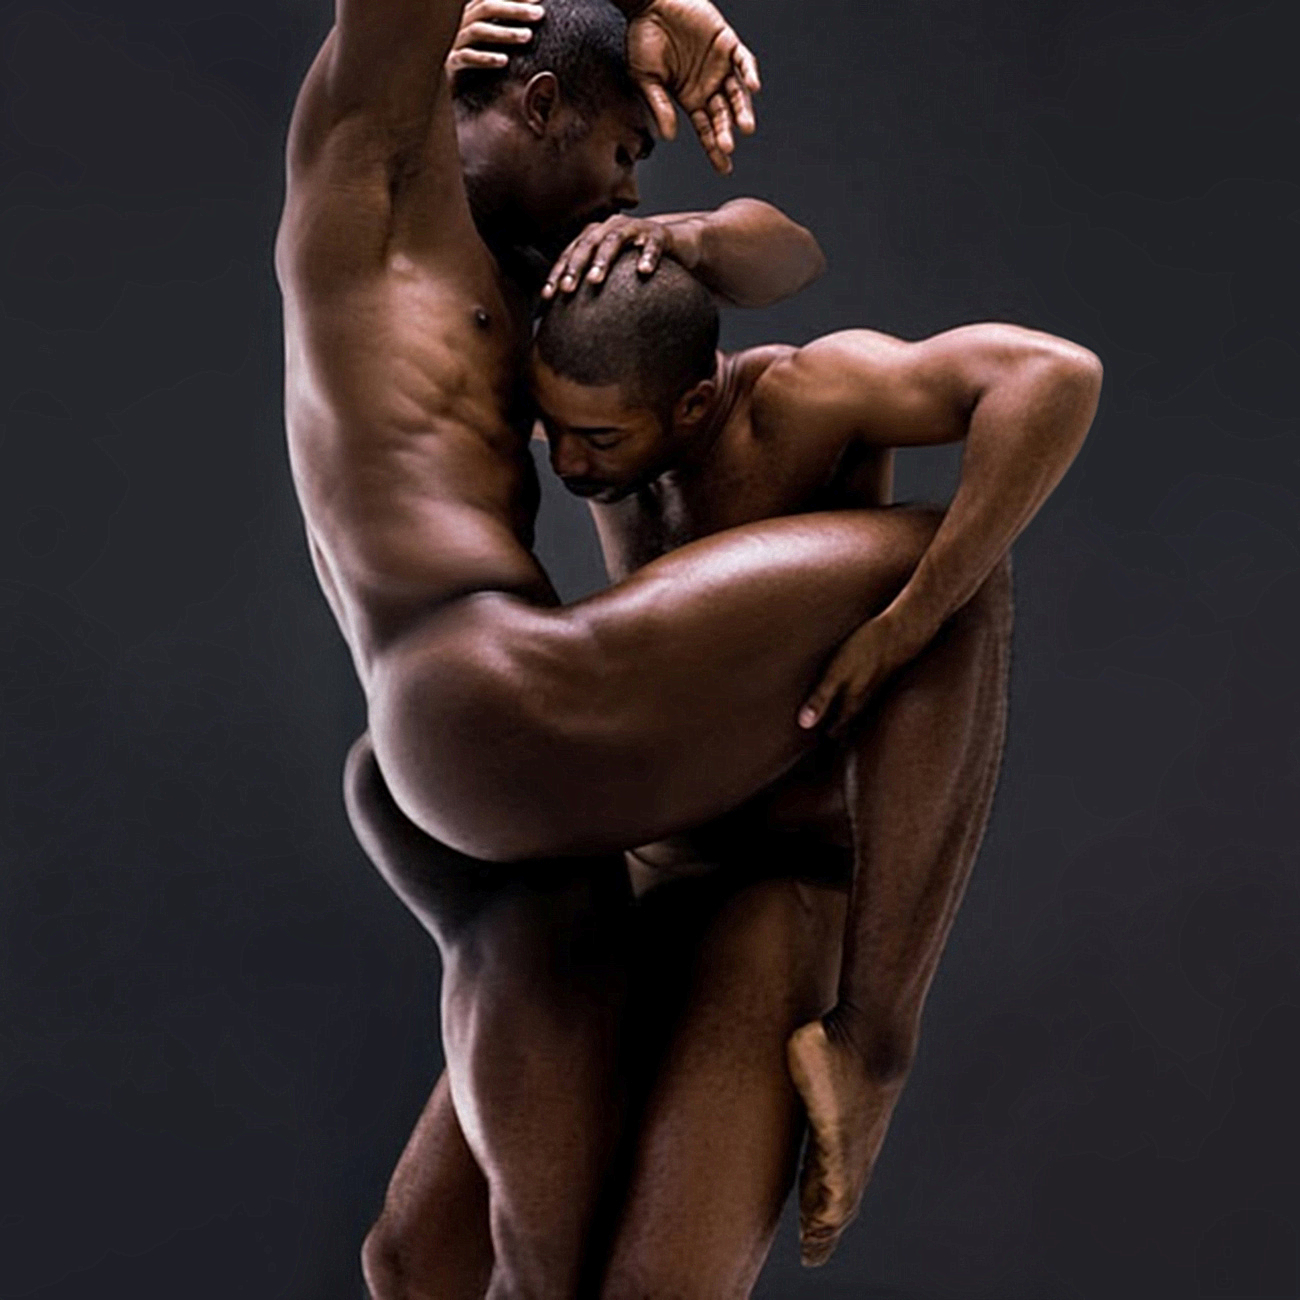 Naked black men spoon